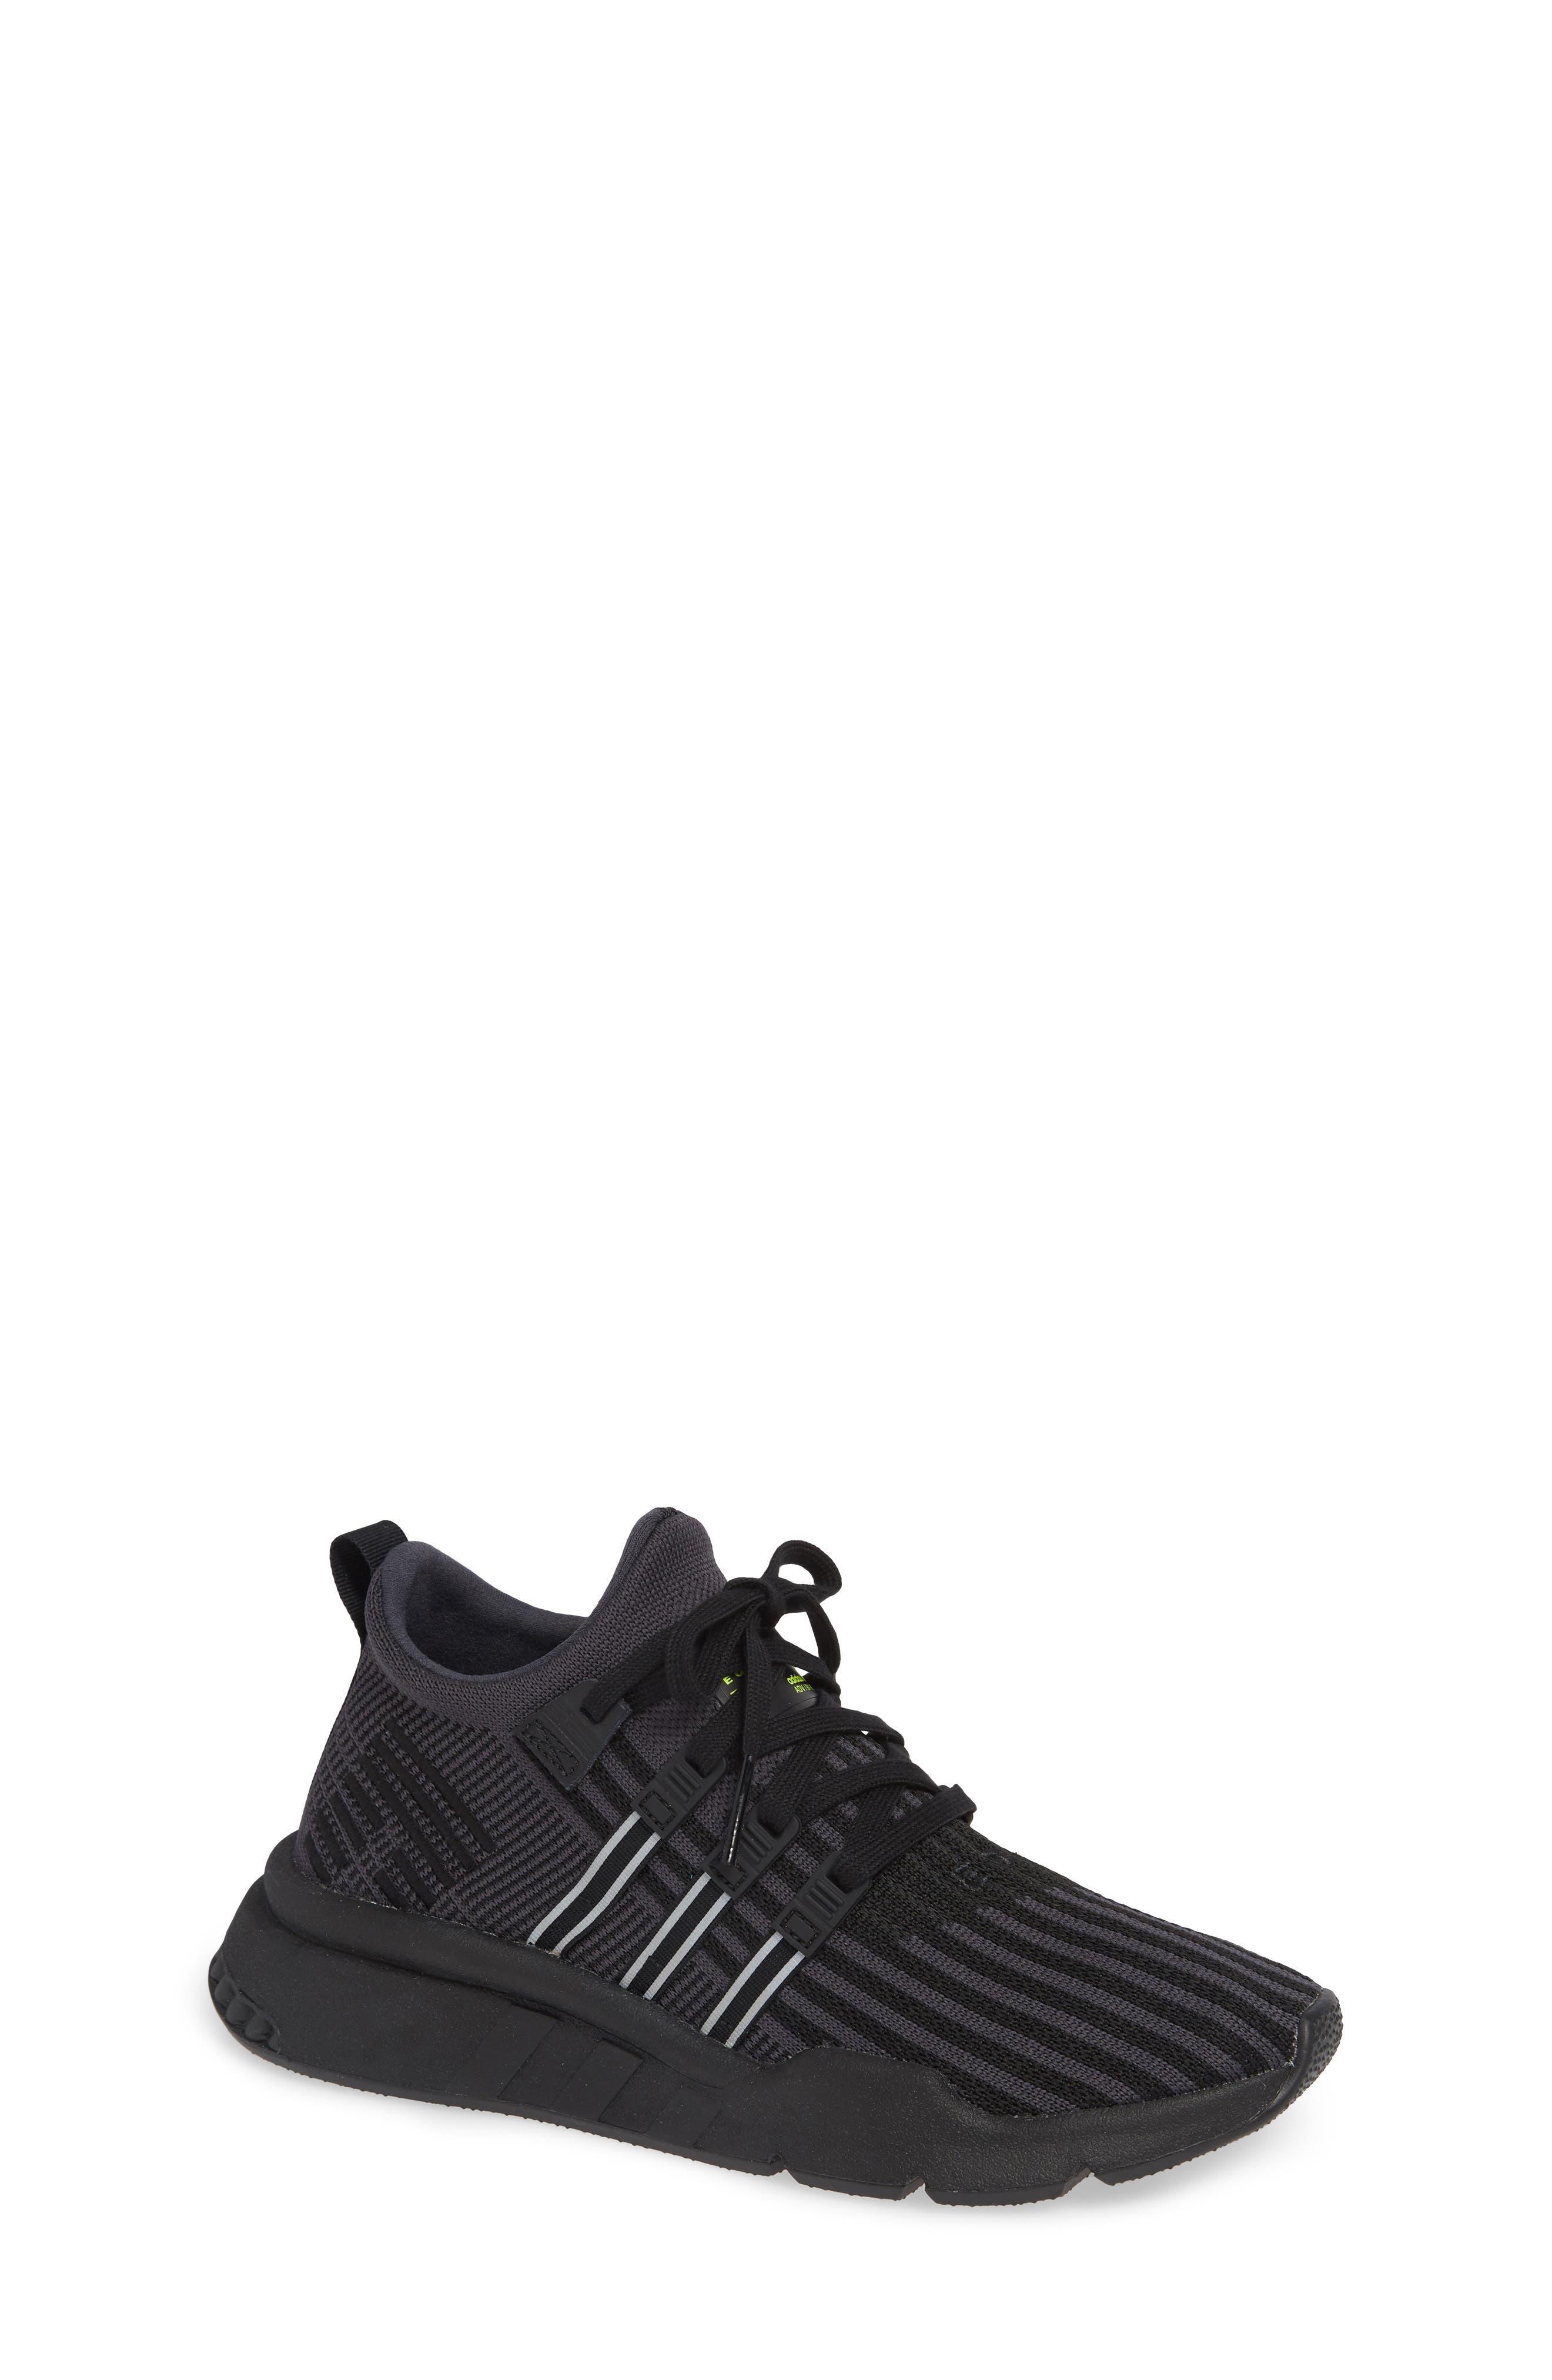 EQT Support Adv Sneaker,                             Main thumbnail 1, color,                             001